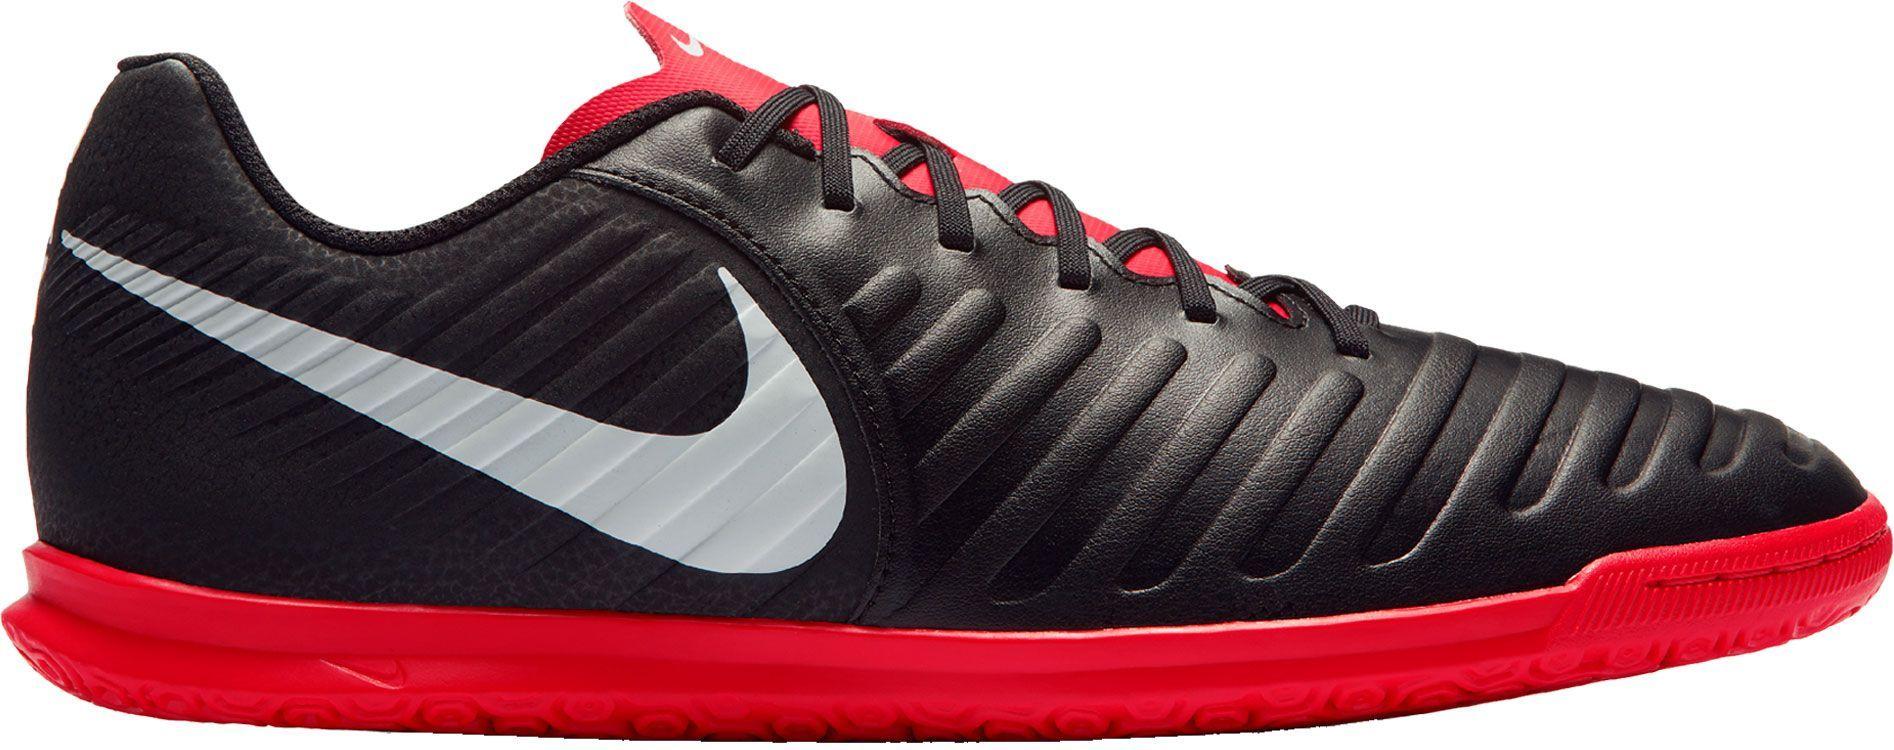 Nike Tiempox Legend 7 Club Indoor Soccer Shoes Soccer Shoes Indoor Soccer Indoor Soccer Cleats